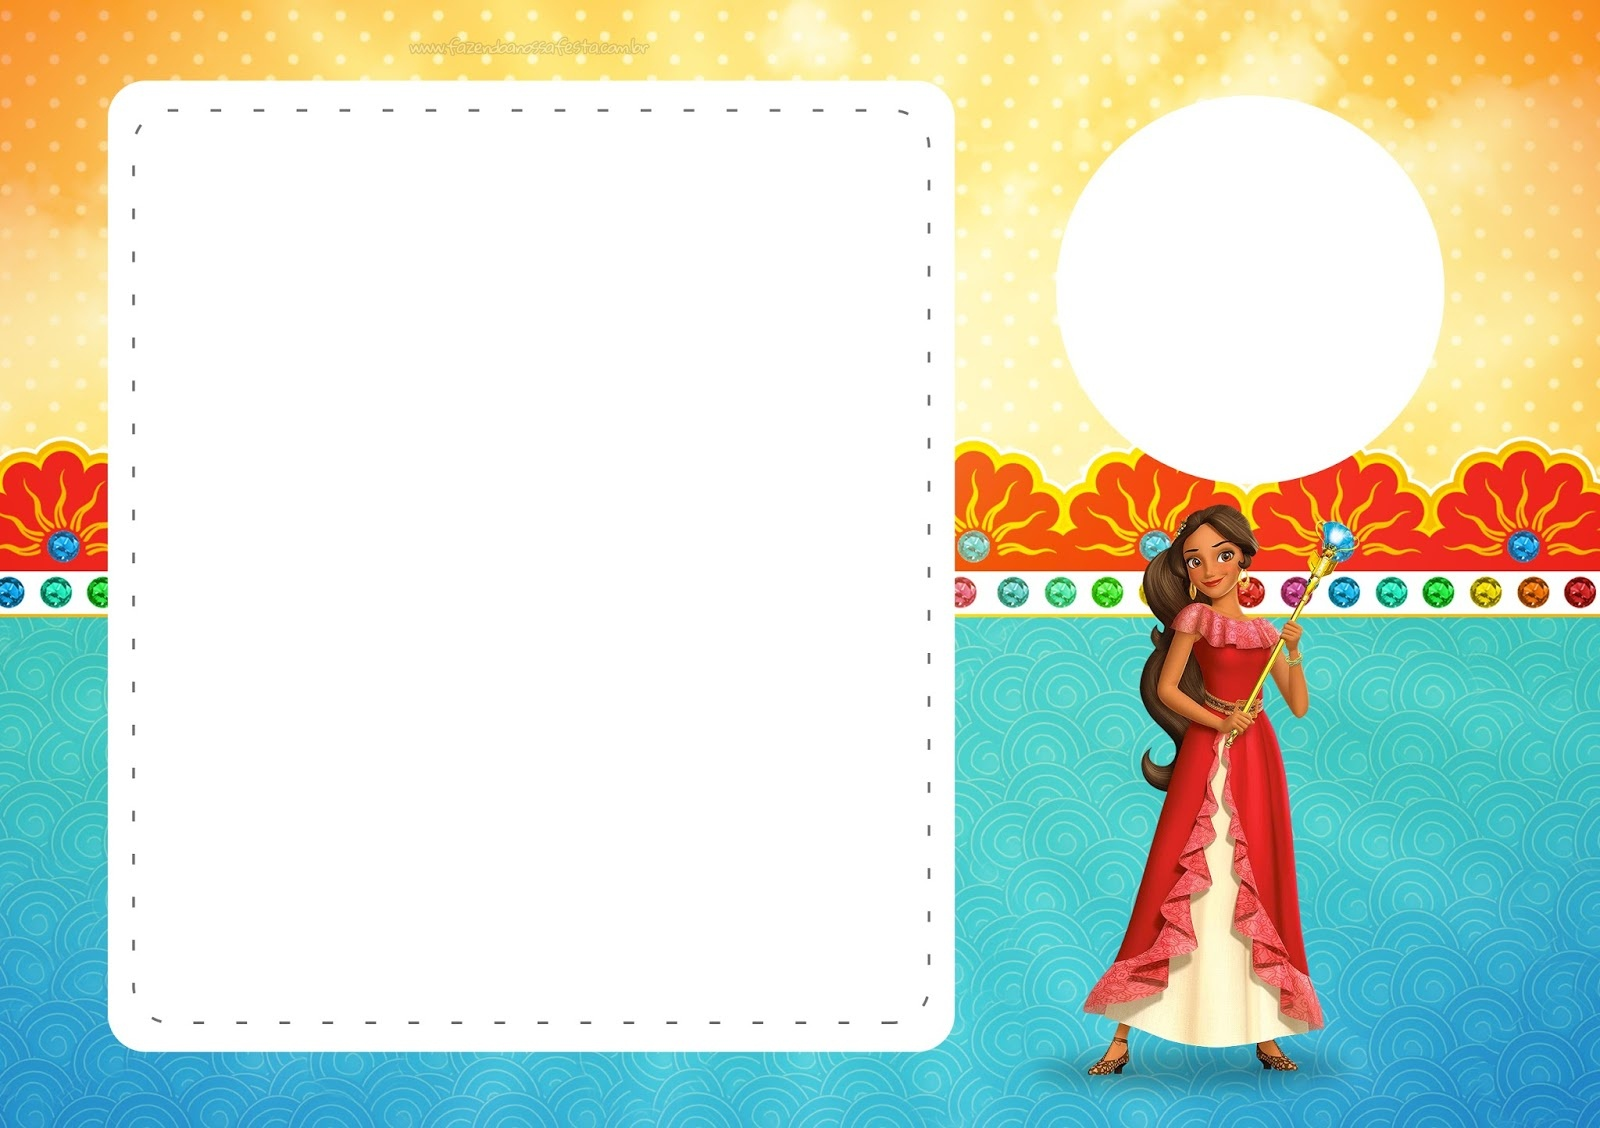 Elena Of Avalor: Free Printable Invitations. - Oh My Fiesta! In English - Elena Of Avalor Free Printables